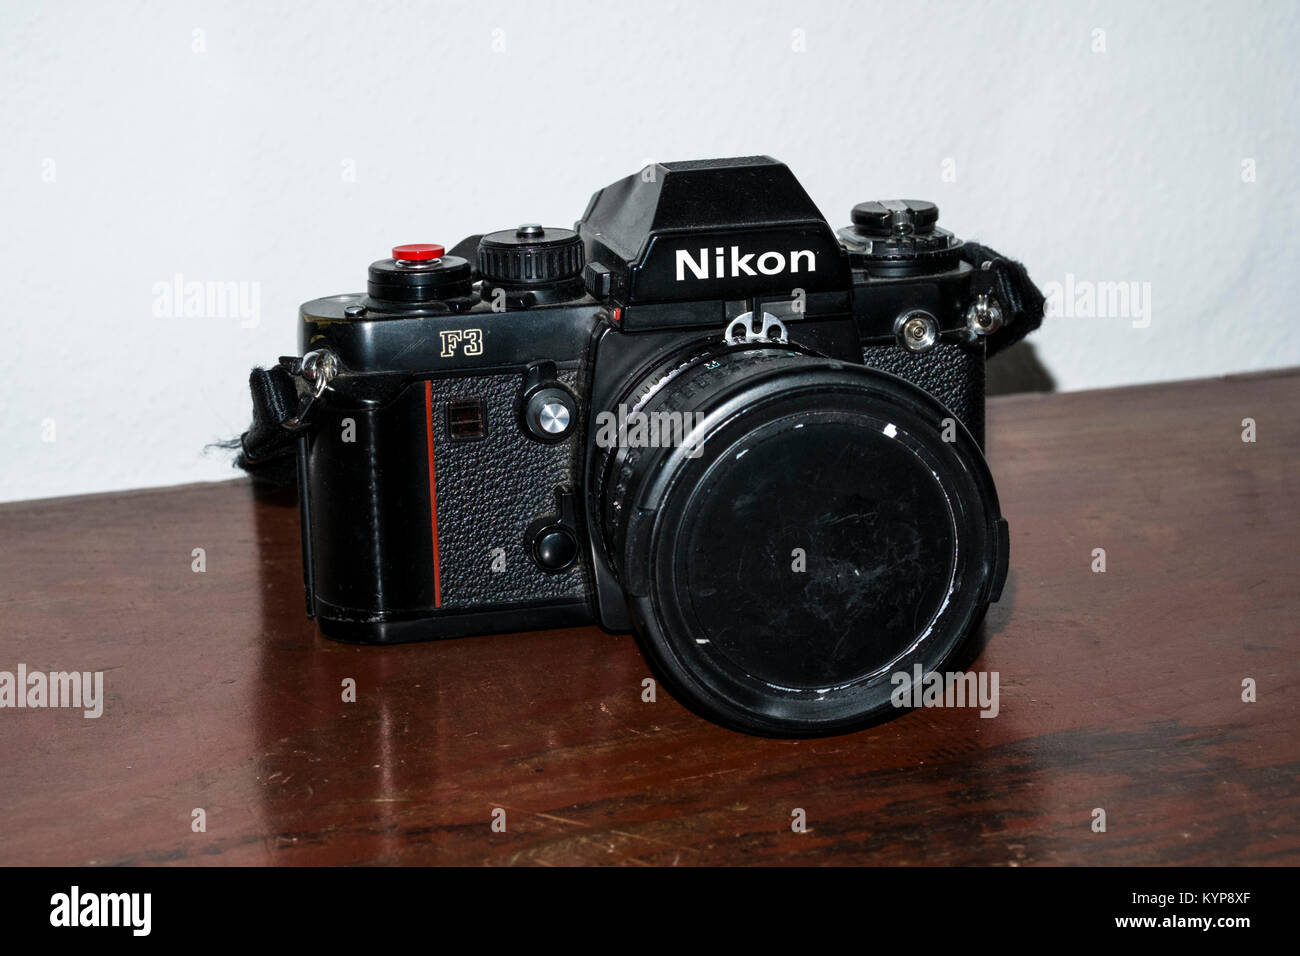 Nikon F3 classic film SLR - Stock Image